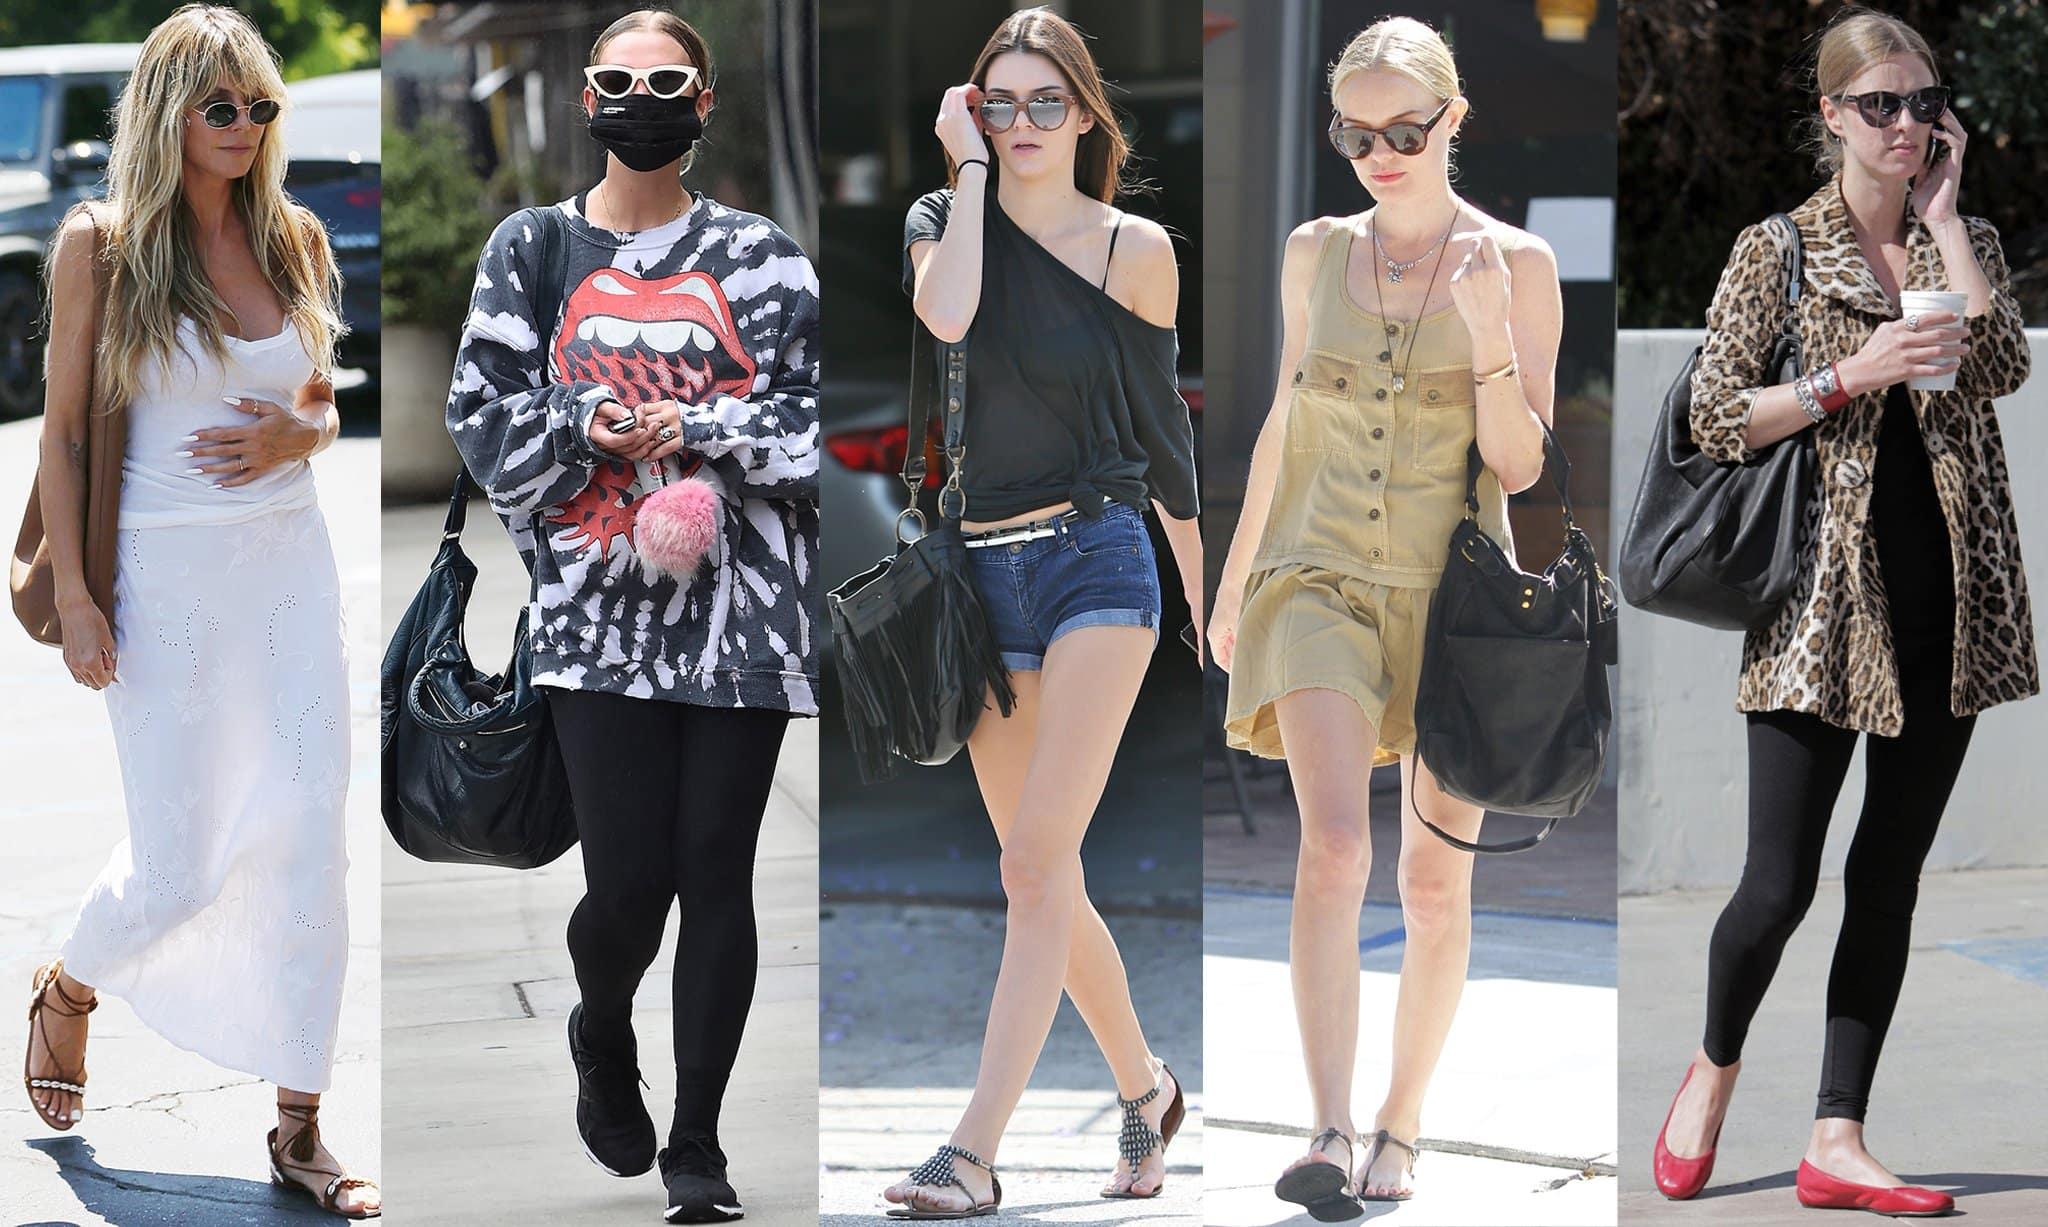 Heidi Klum, Ashlee Simpson, Kendall Jenner, Kate Bosworth, and Nicky Hilton carrying hobo bags